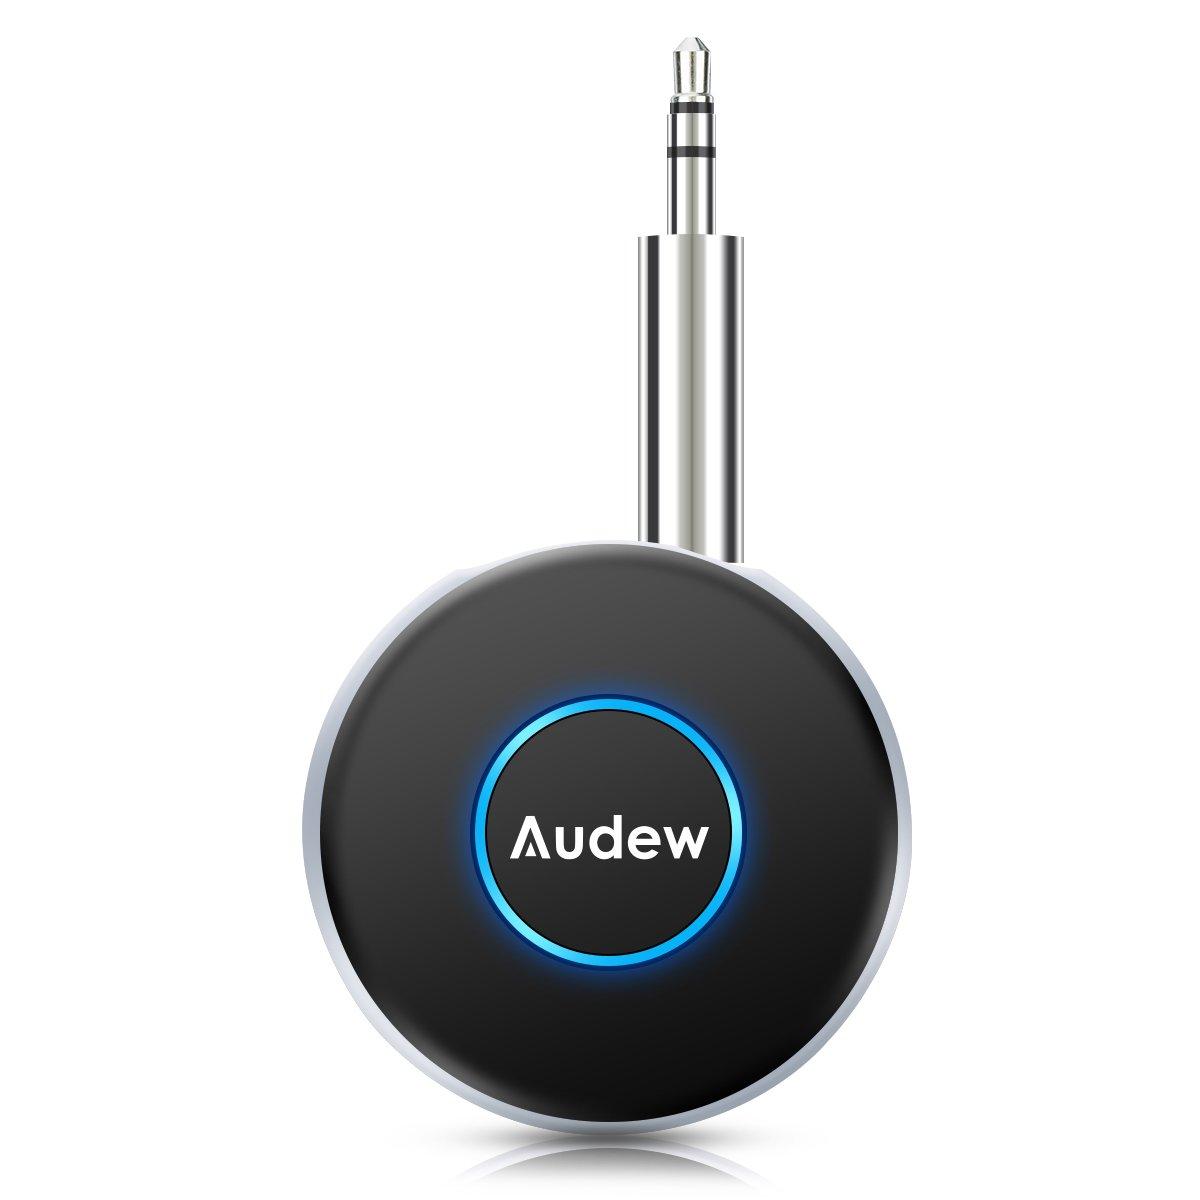 AUDEW Bluetoothレシーバー オーディオレシーバー ワイヤレス受信機:タイムセール特価15%割引